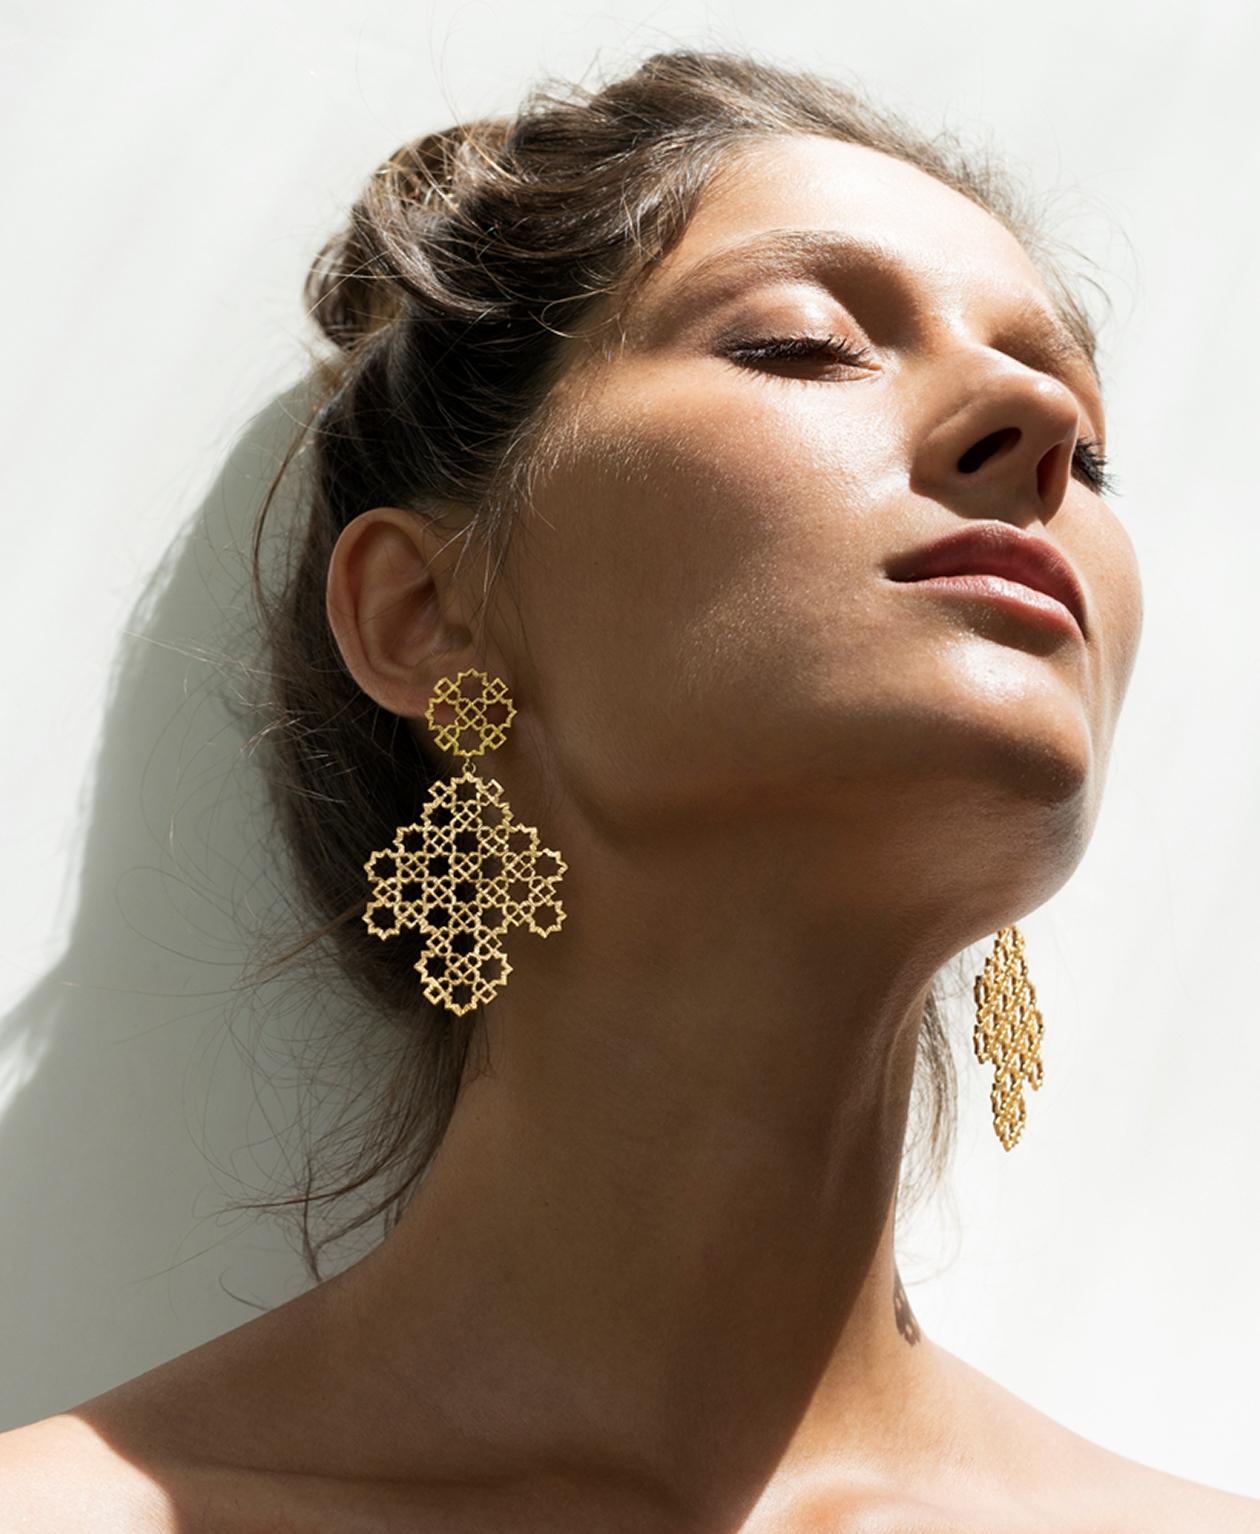 Ketama Earrings - Image